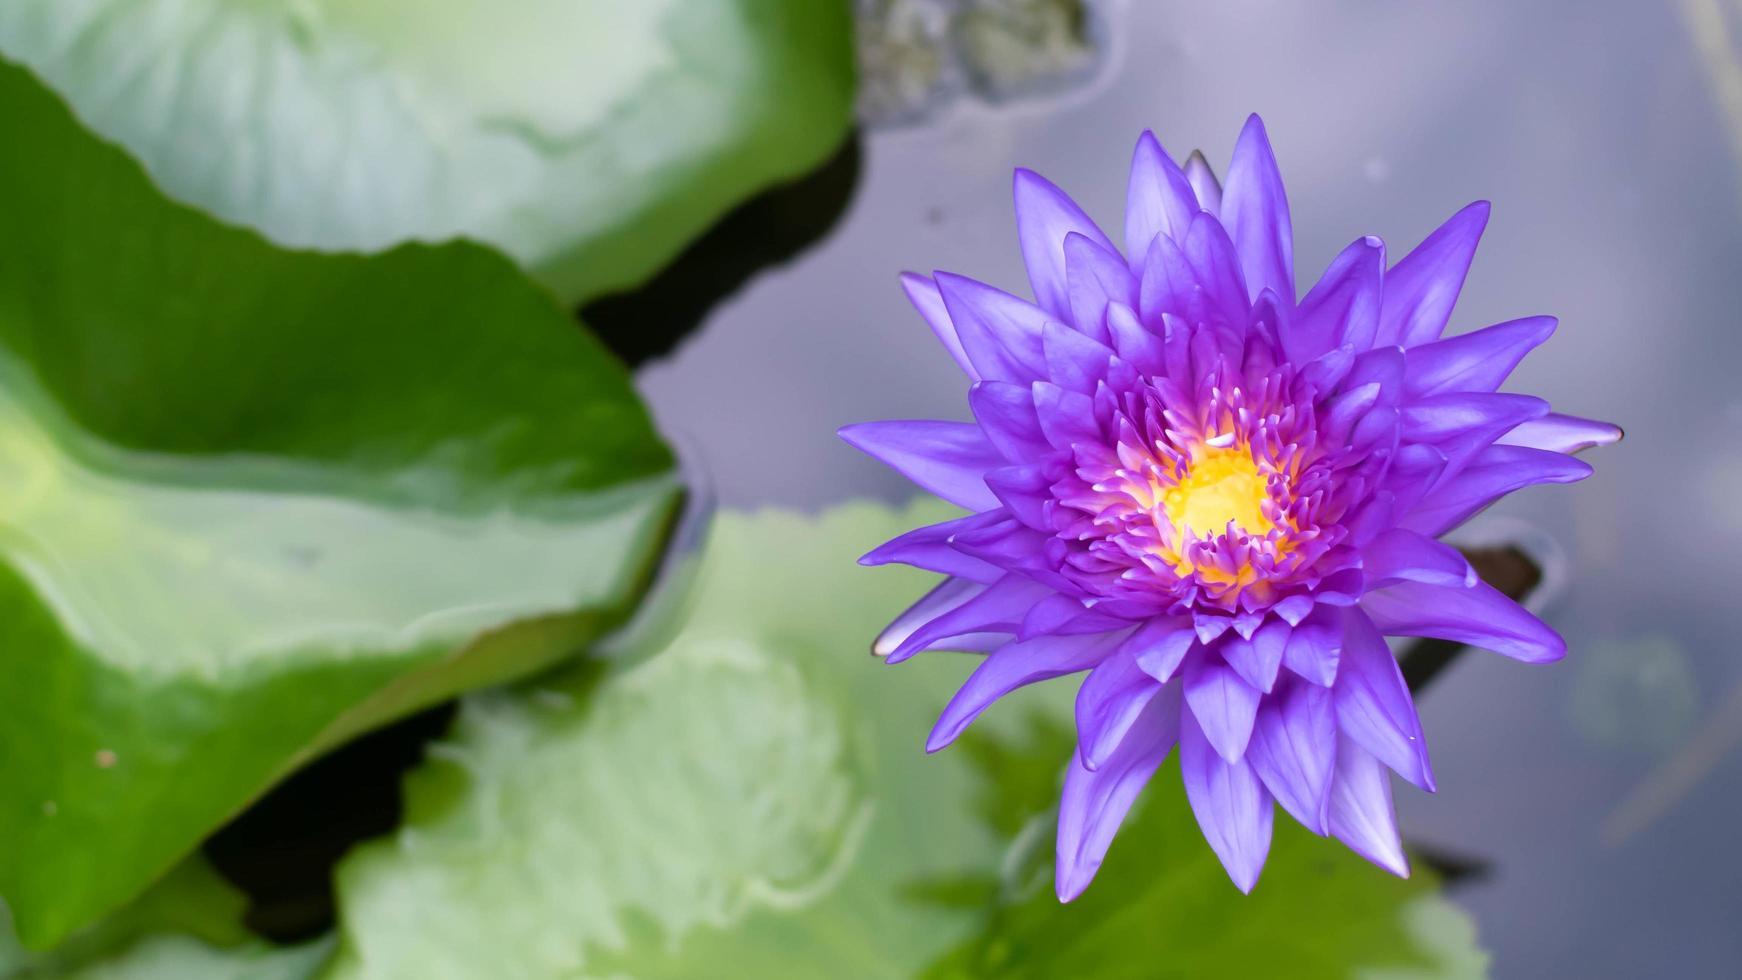 flor de loto púrpura en un estanque foto